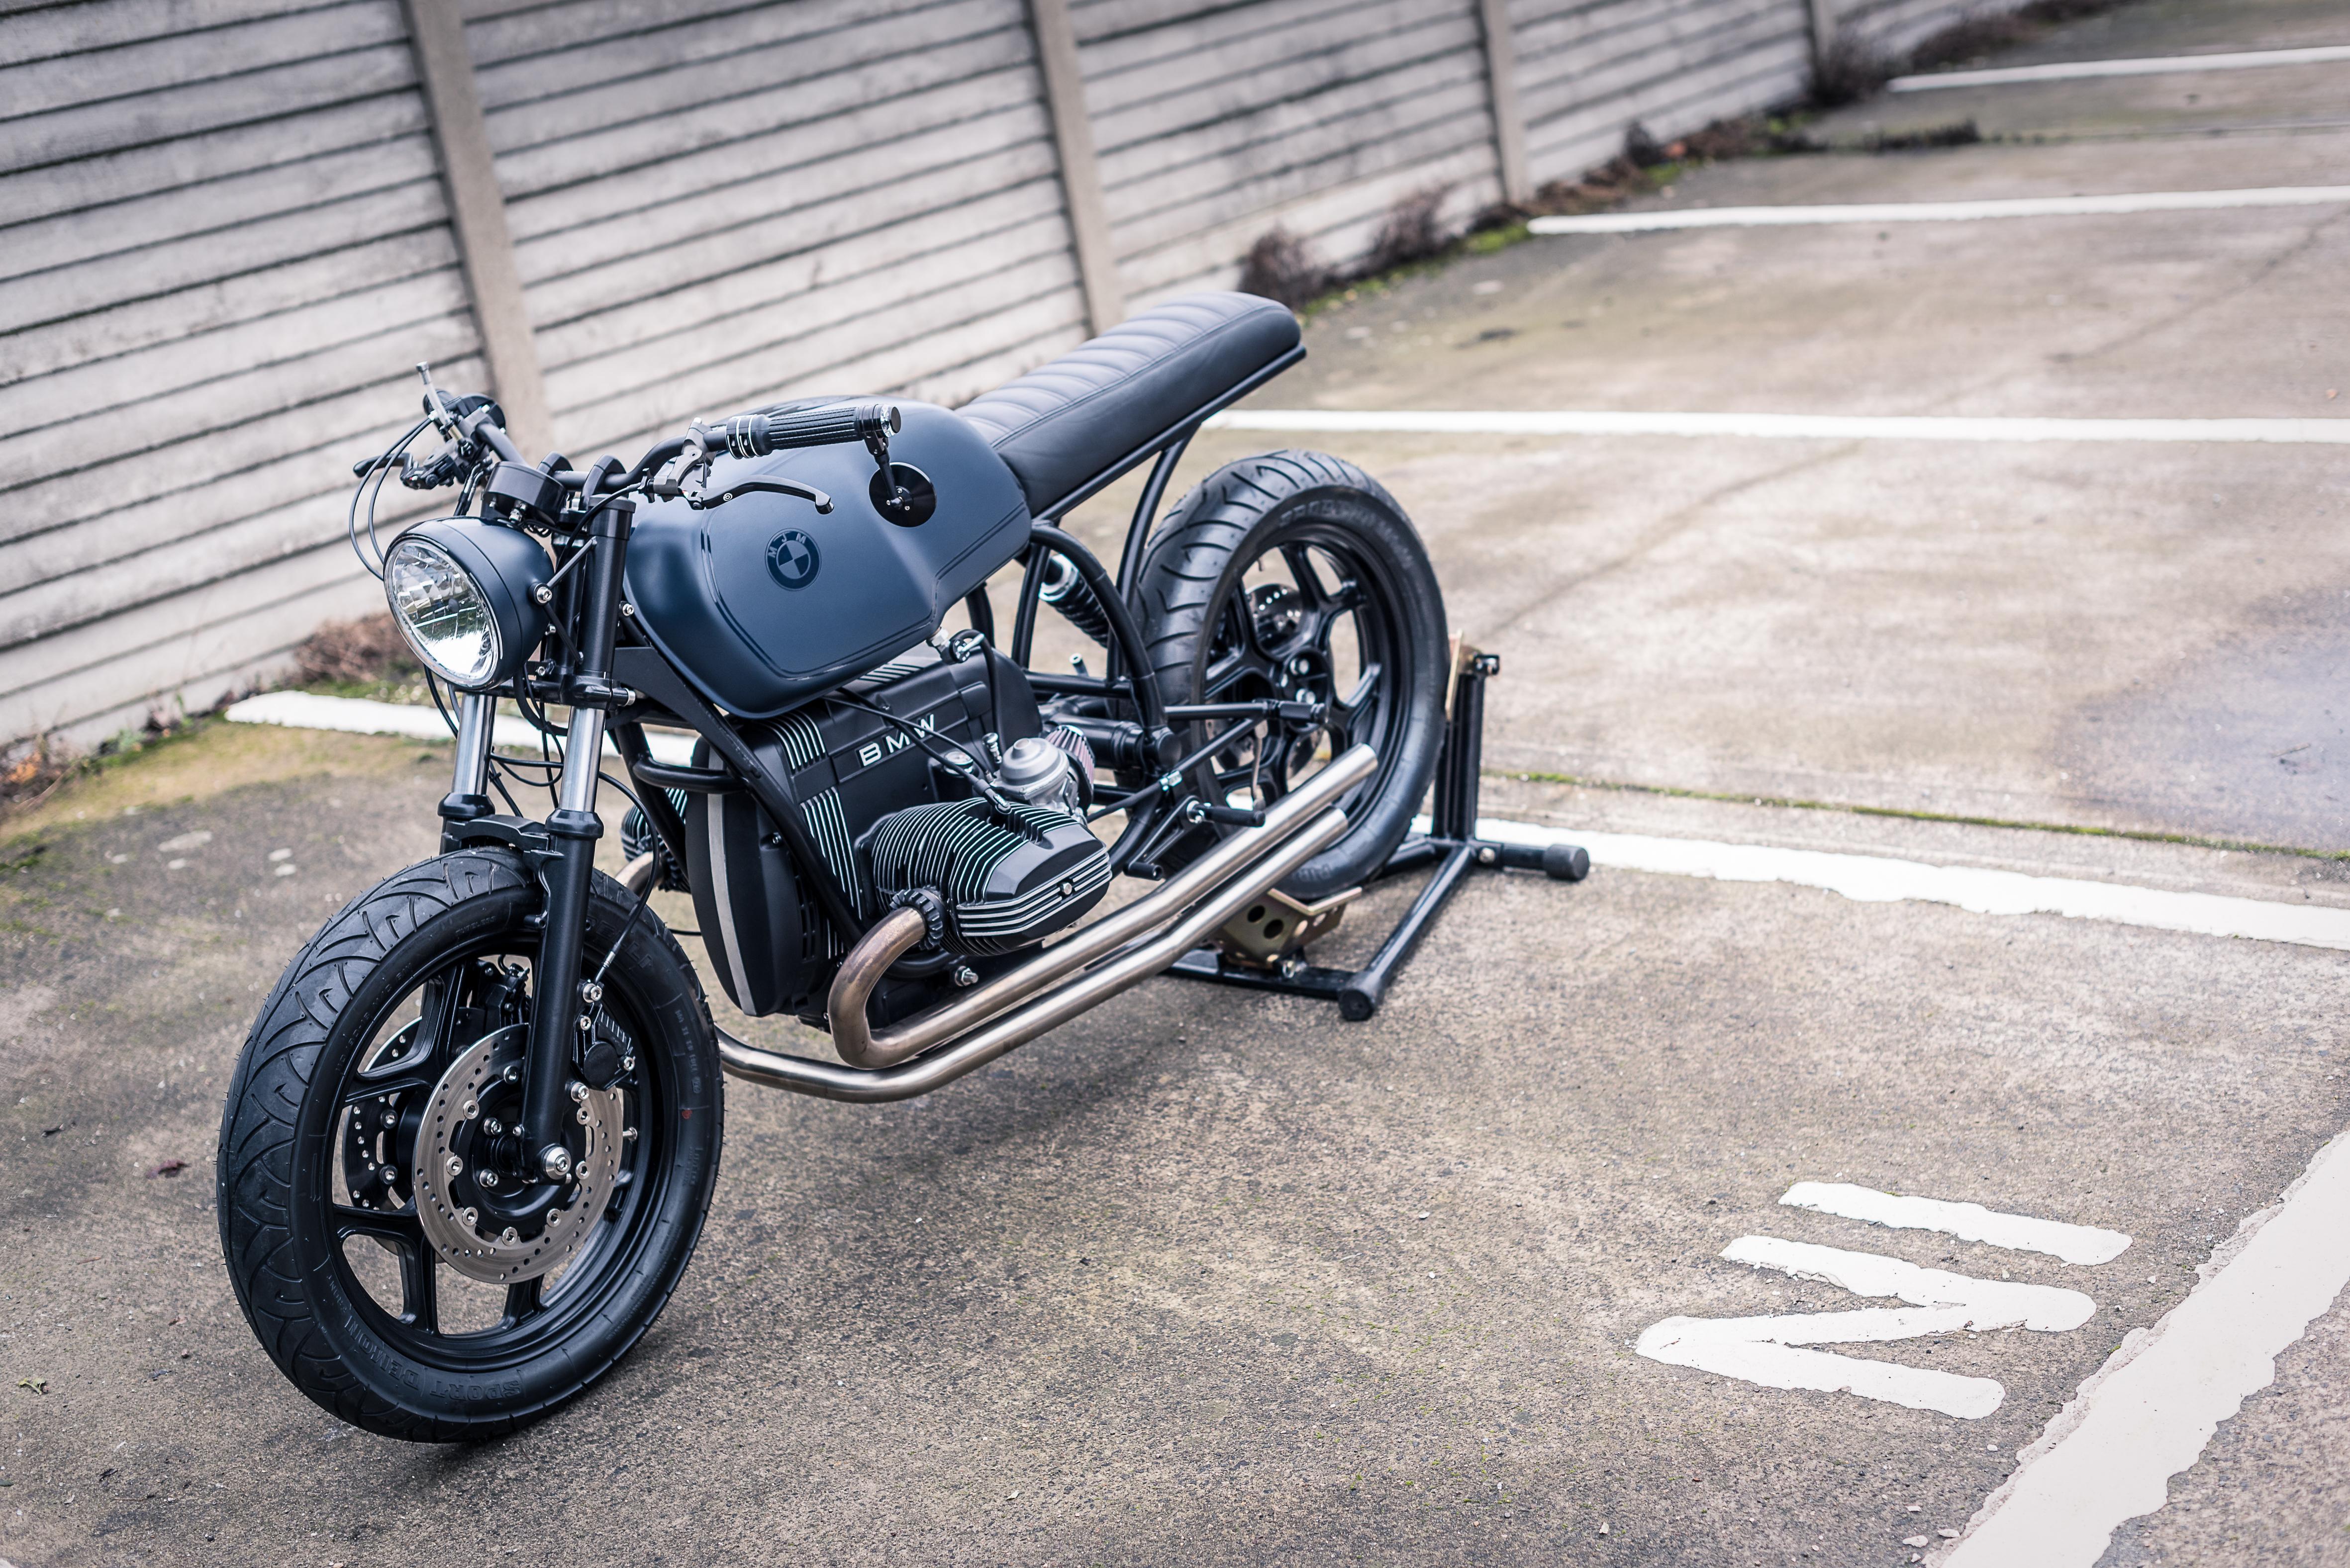 Cafe Racer and Custom bikes |Engine Rebuid | UK | Sinroja